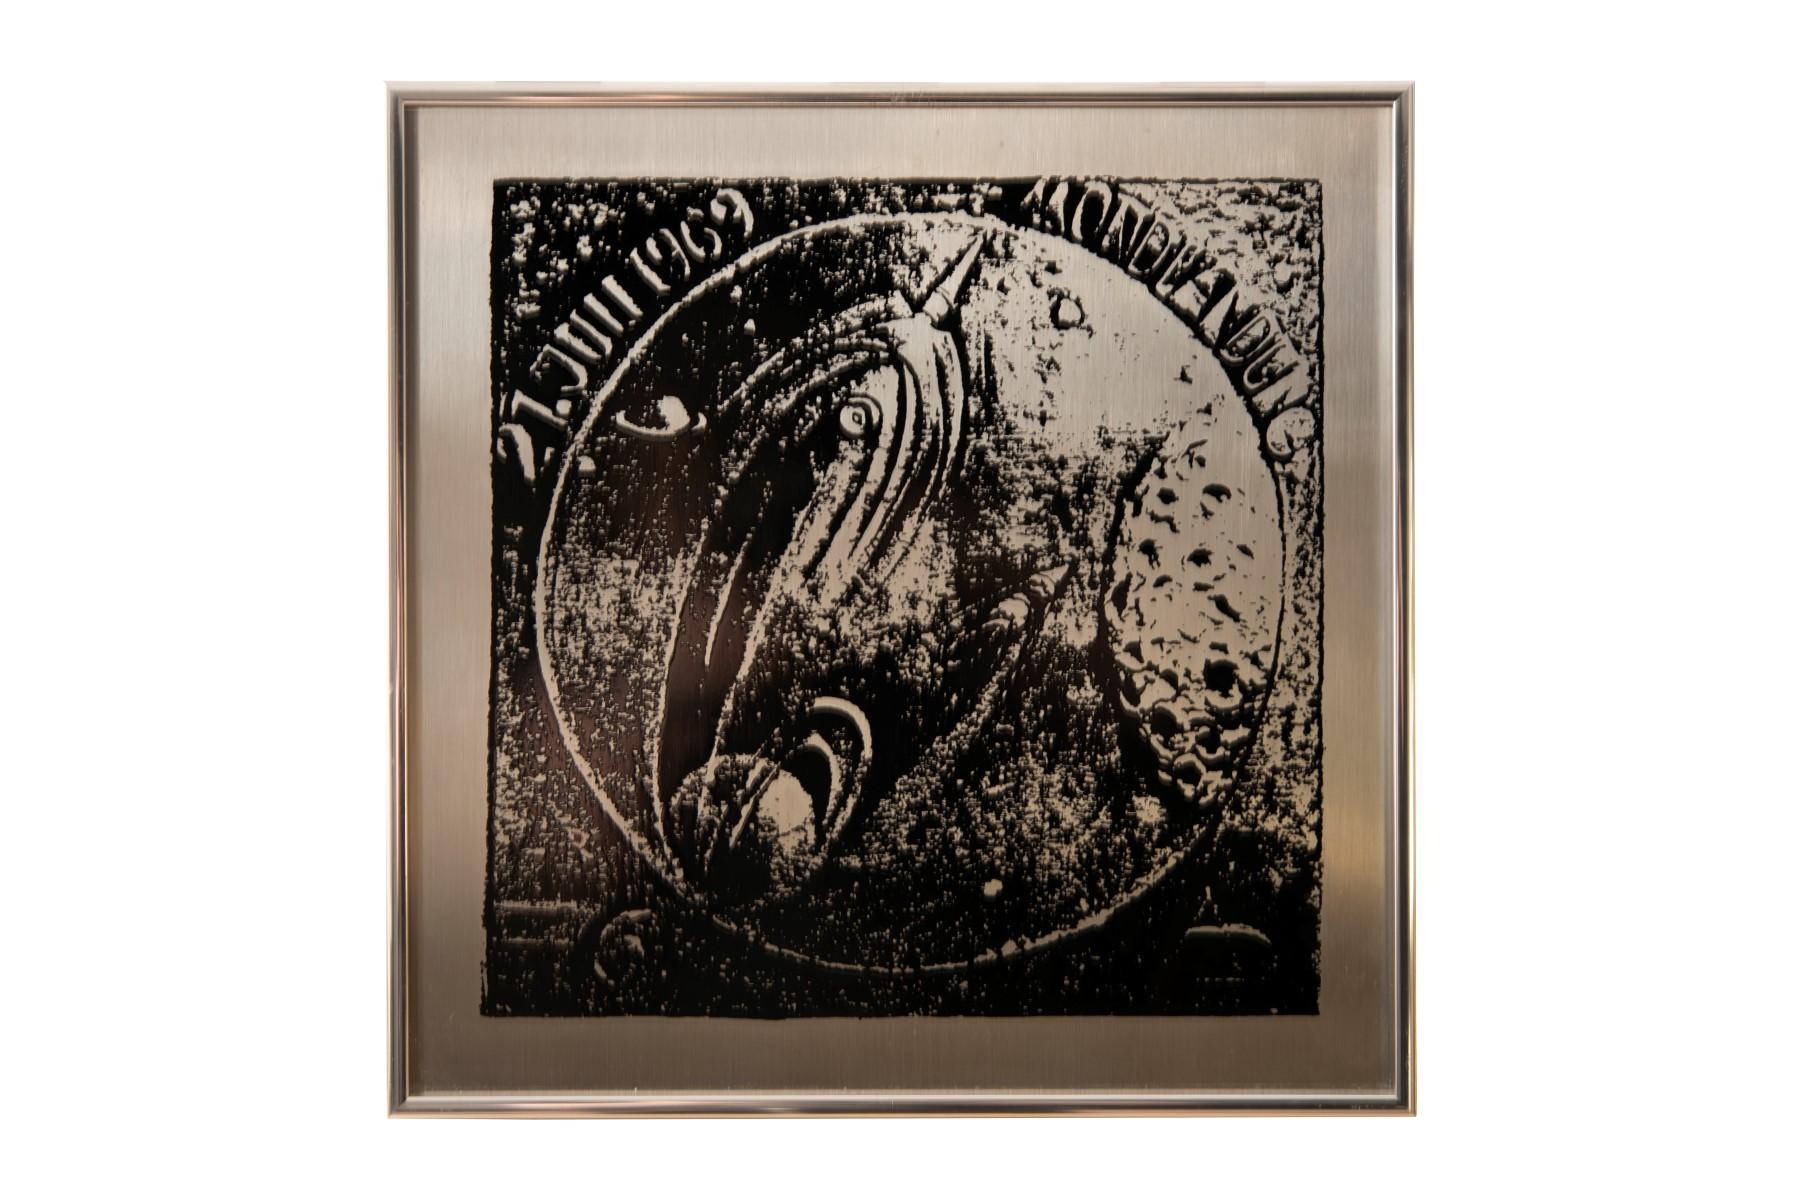 #7 Alexander Diepold* (1929-2012) , July 20, 1969 the first Moon Landing   Alexander Diepold* (1929-2012), 20. Juli 1969 die erste Mondlandung Image